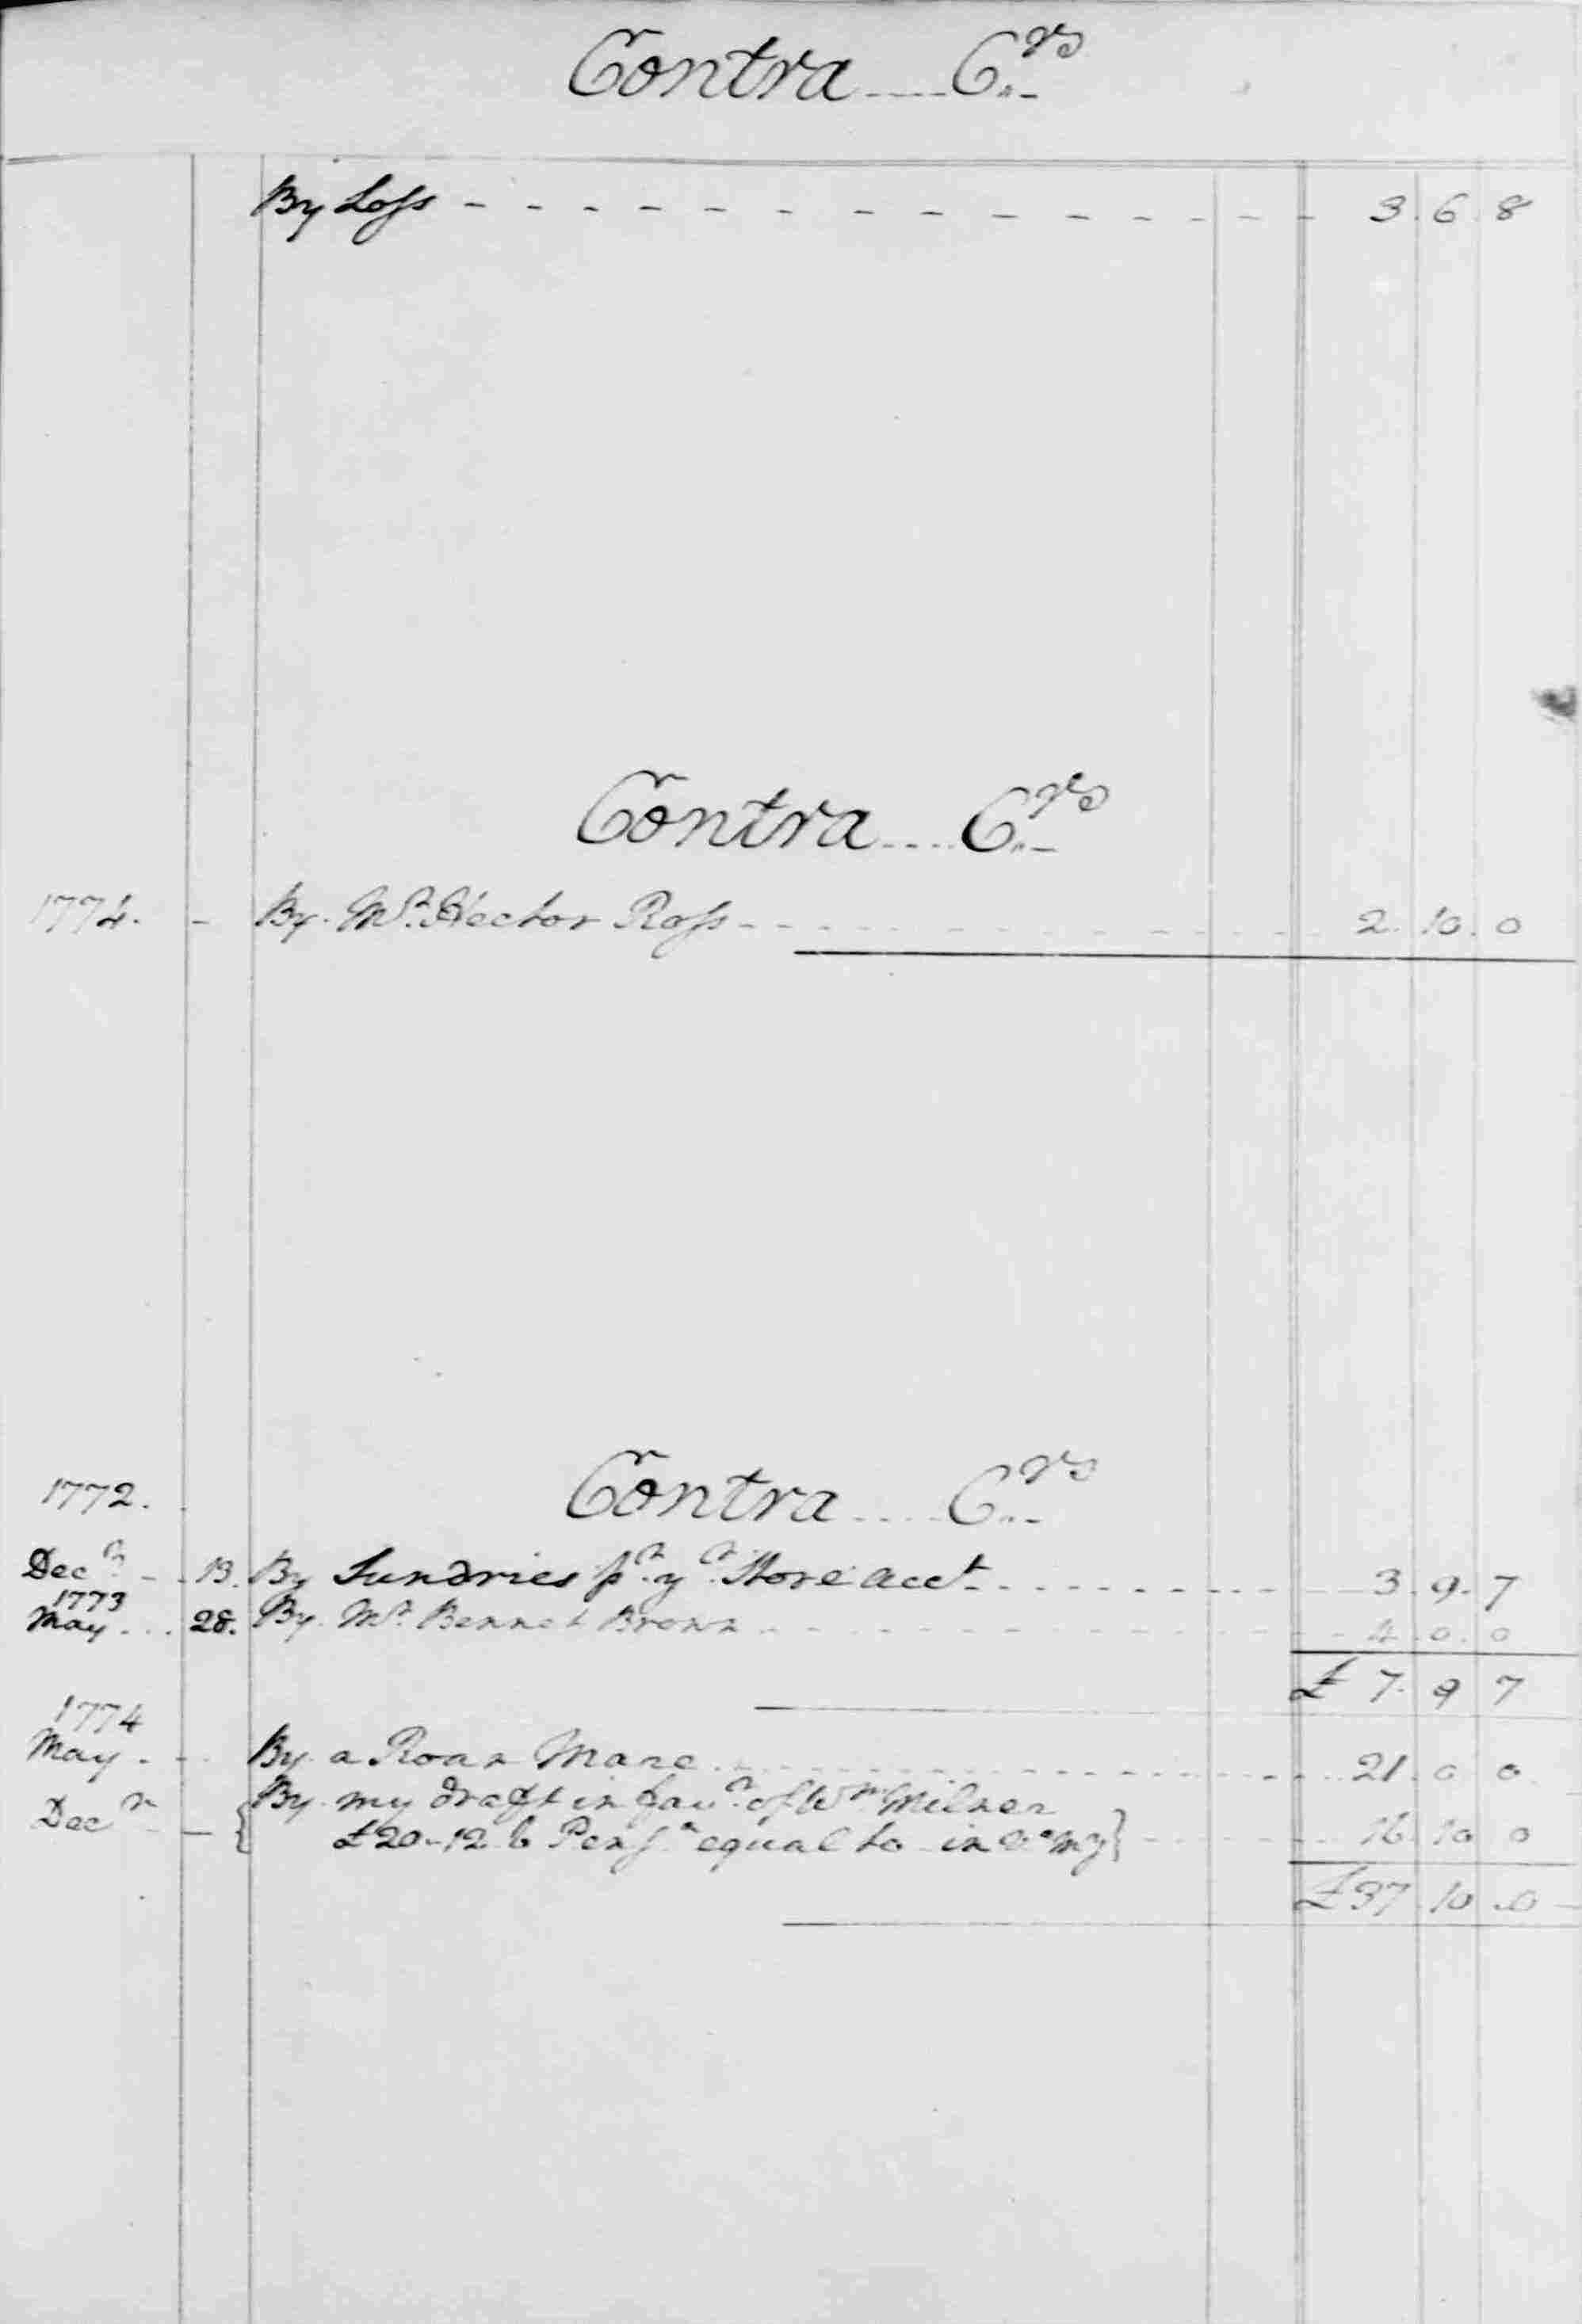 Ledger B, folio 79, right side